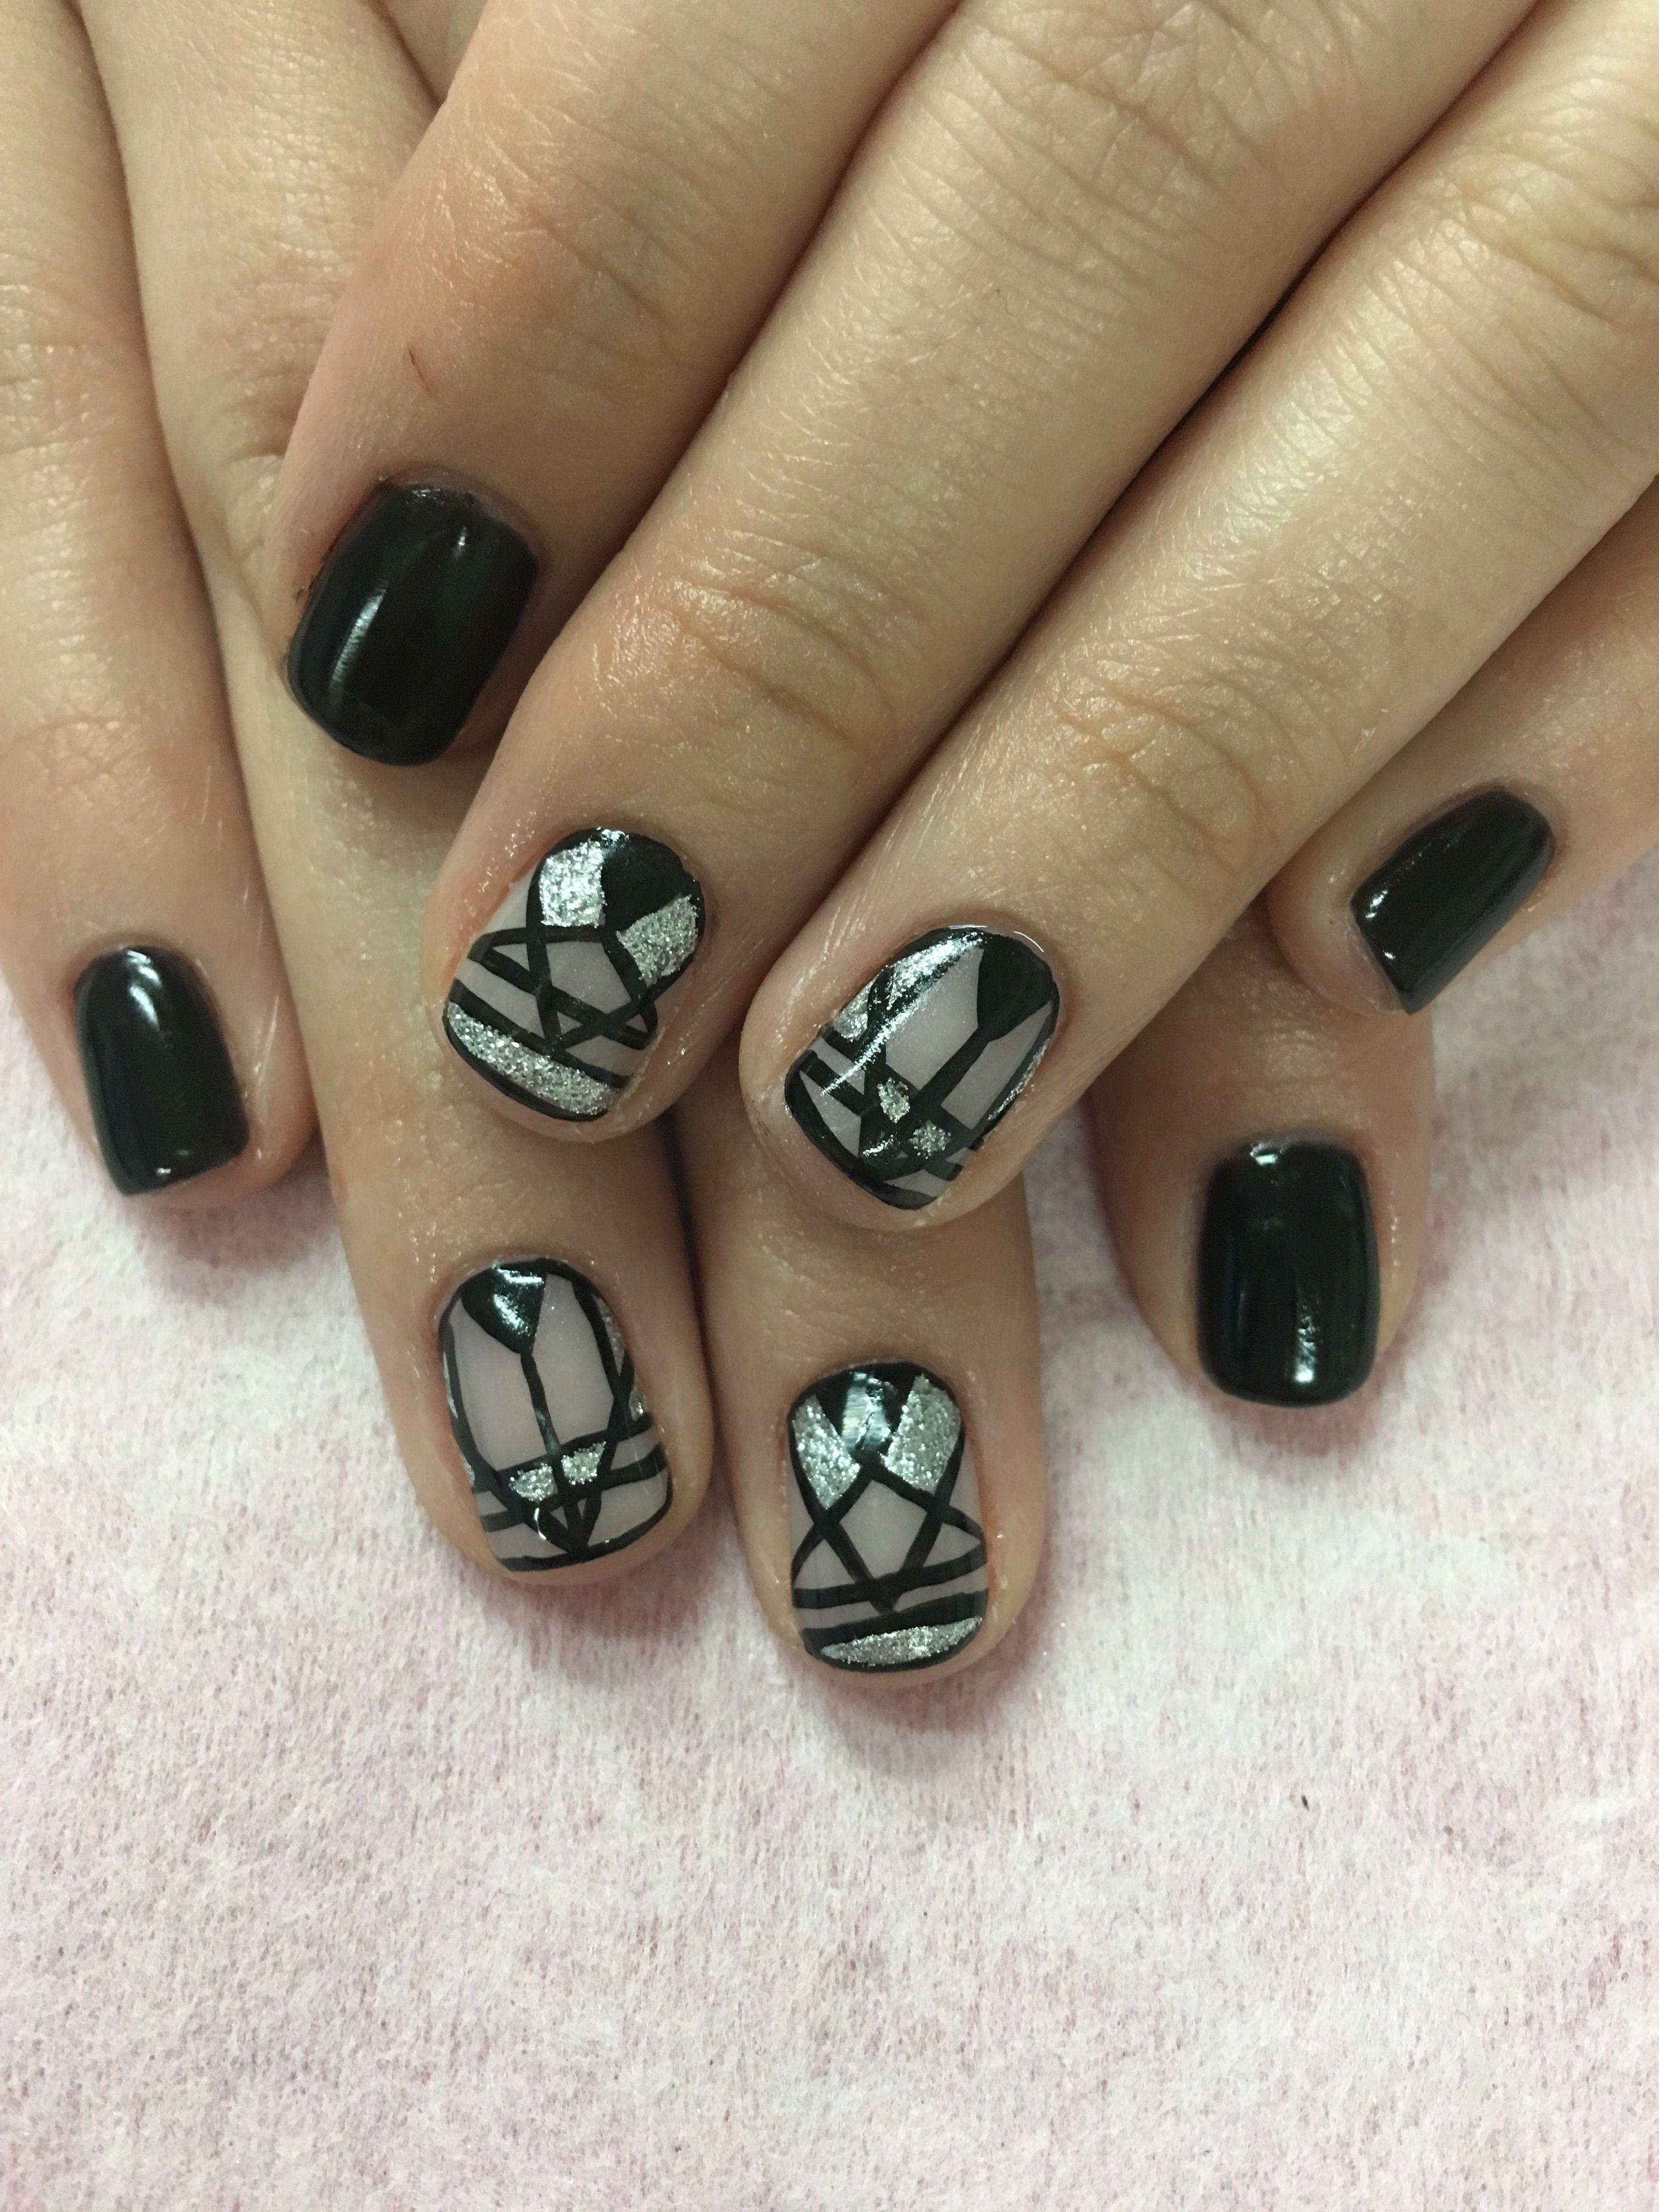 Hand Painted Geometric Design And Black Gel Nails Black Gel Nails Nail Designs Gel Nails